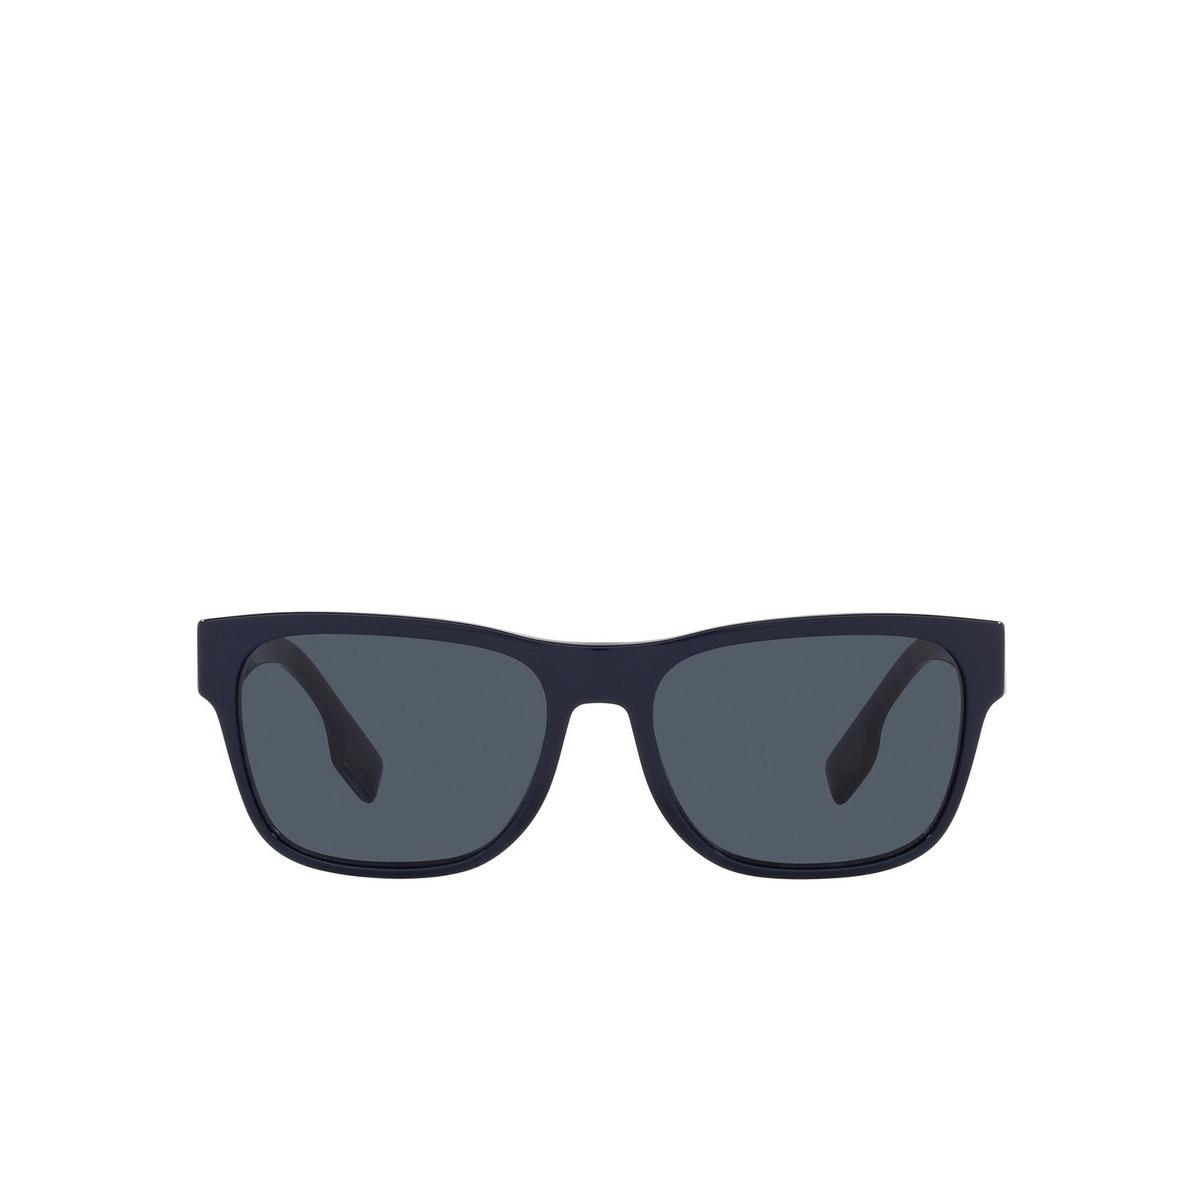 Burberry® Square Sunglasses: BE4309 color Matte Black 346487 - front view.